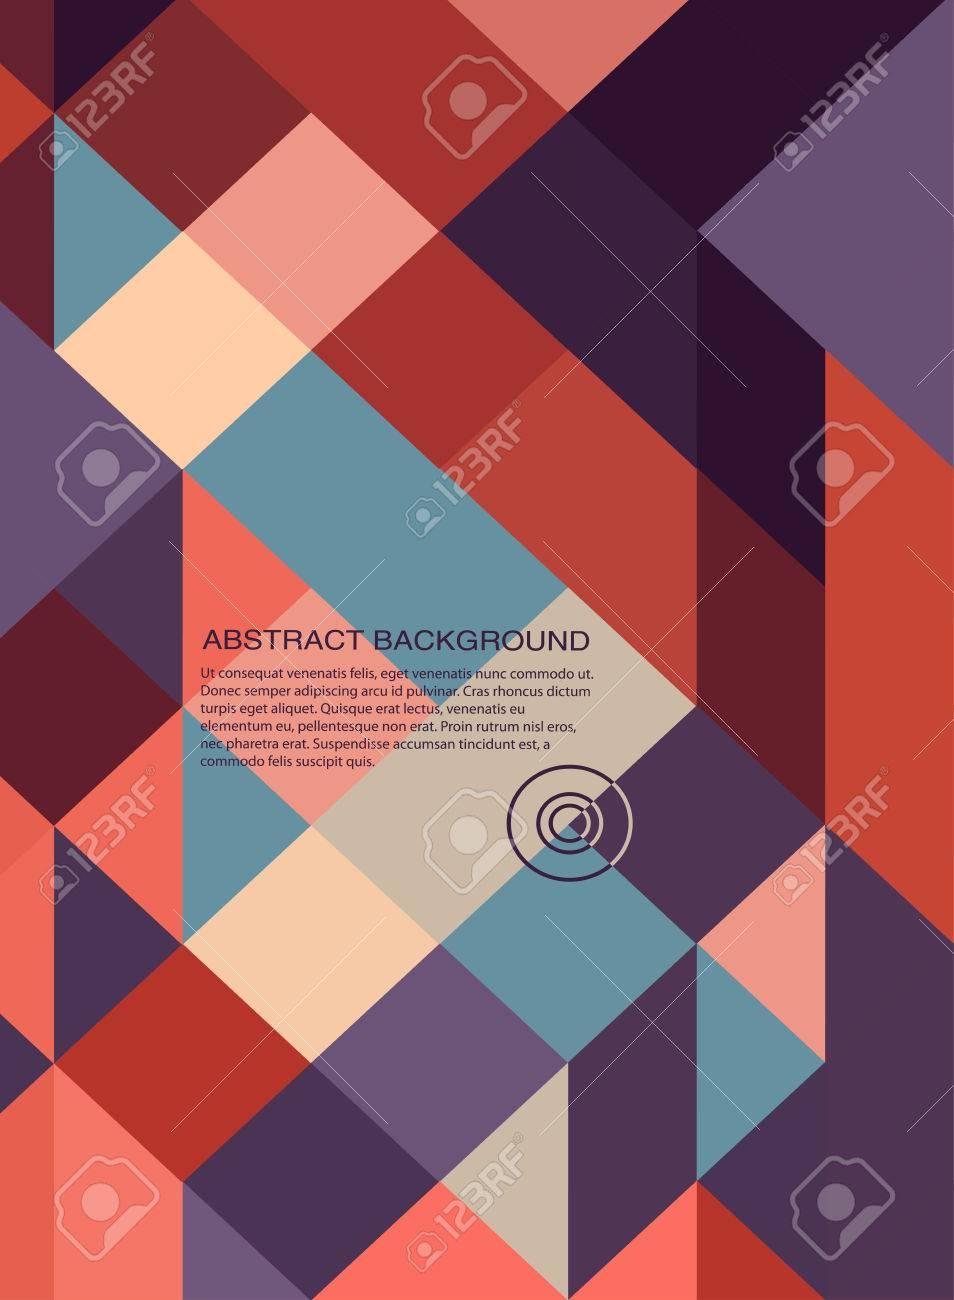 Abstract Book Cover Background Design Retro Mosaic Brochure Stock Vector